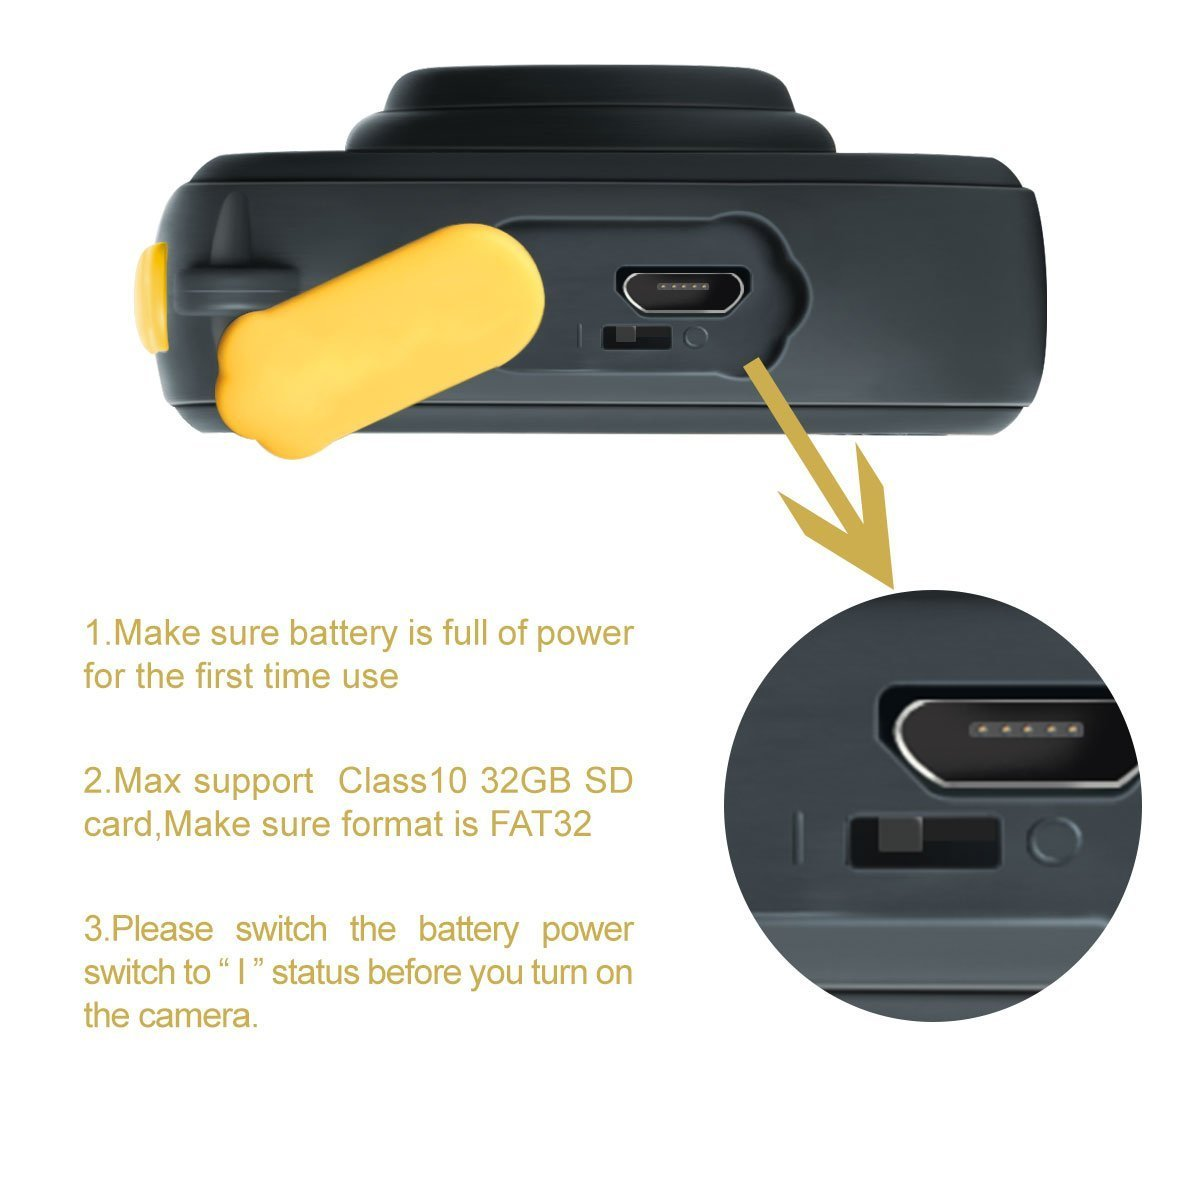 Cikuso Camara de accion HD Video Digital Impermeable para ninos 720 P Deportes 1.77 Pulgadas Camara de Pantalla LCD Videocamara DV para ninos Ninas Regalo ...